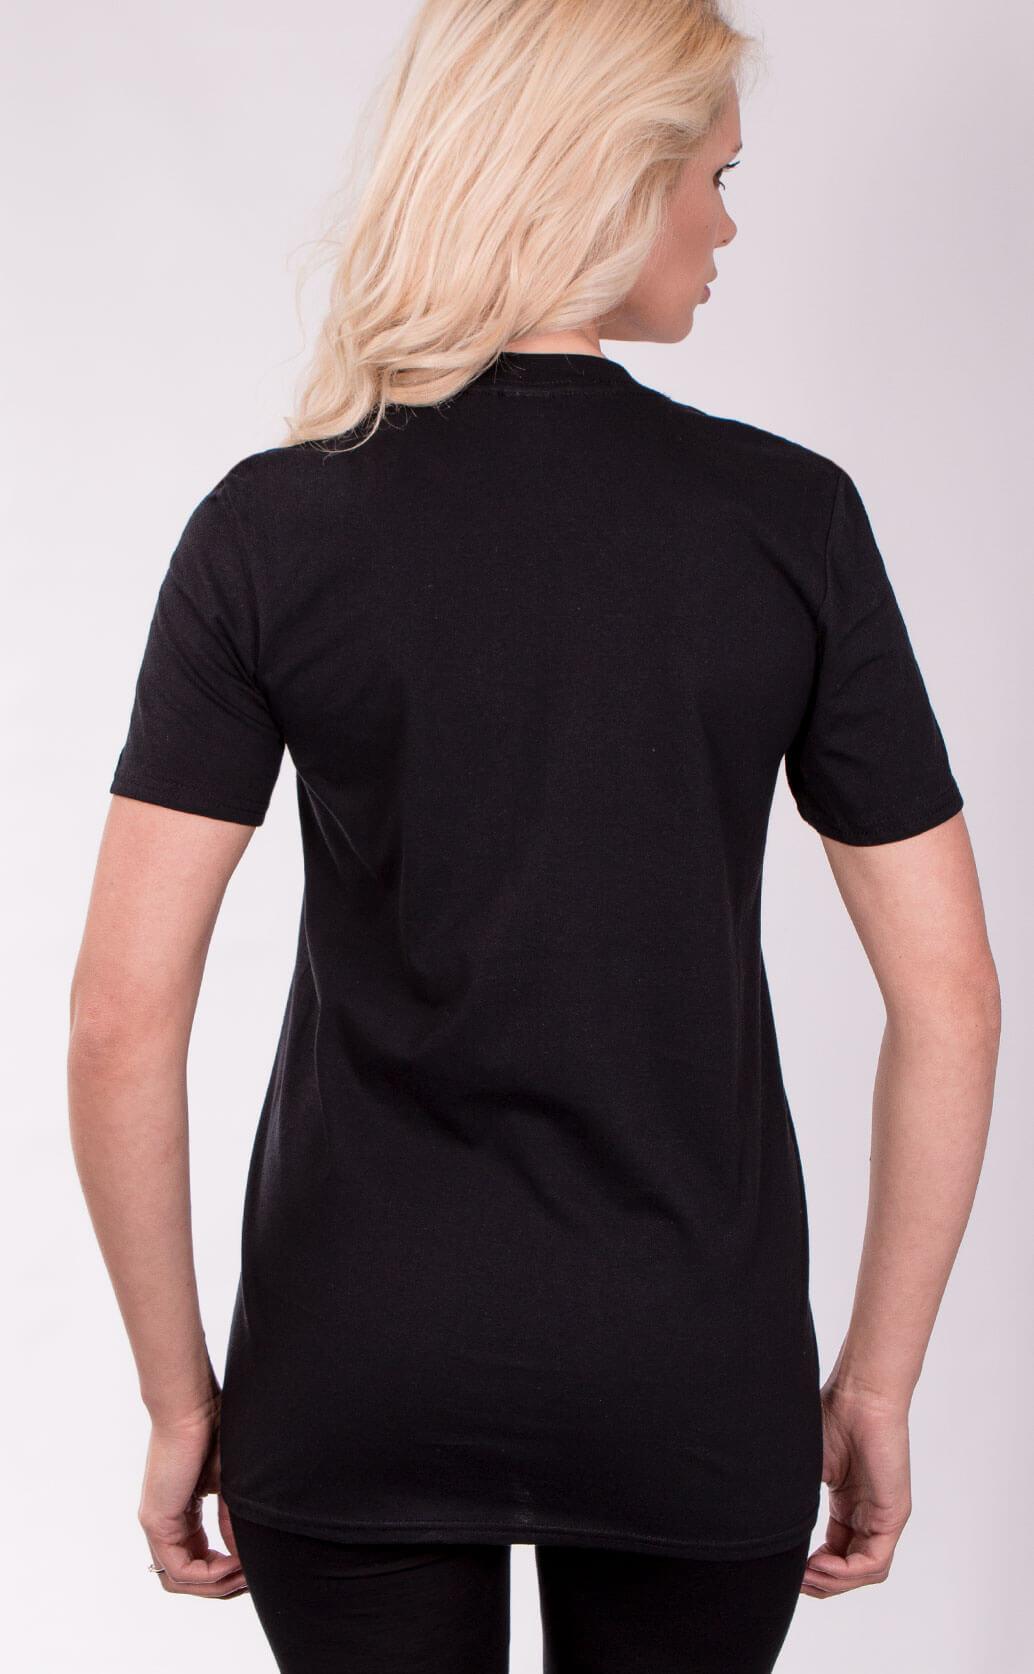 Size Guide Unisex T Shirt shirt type back